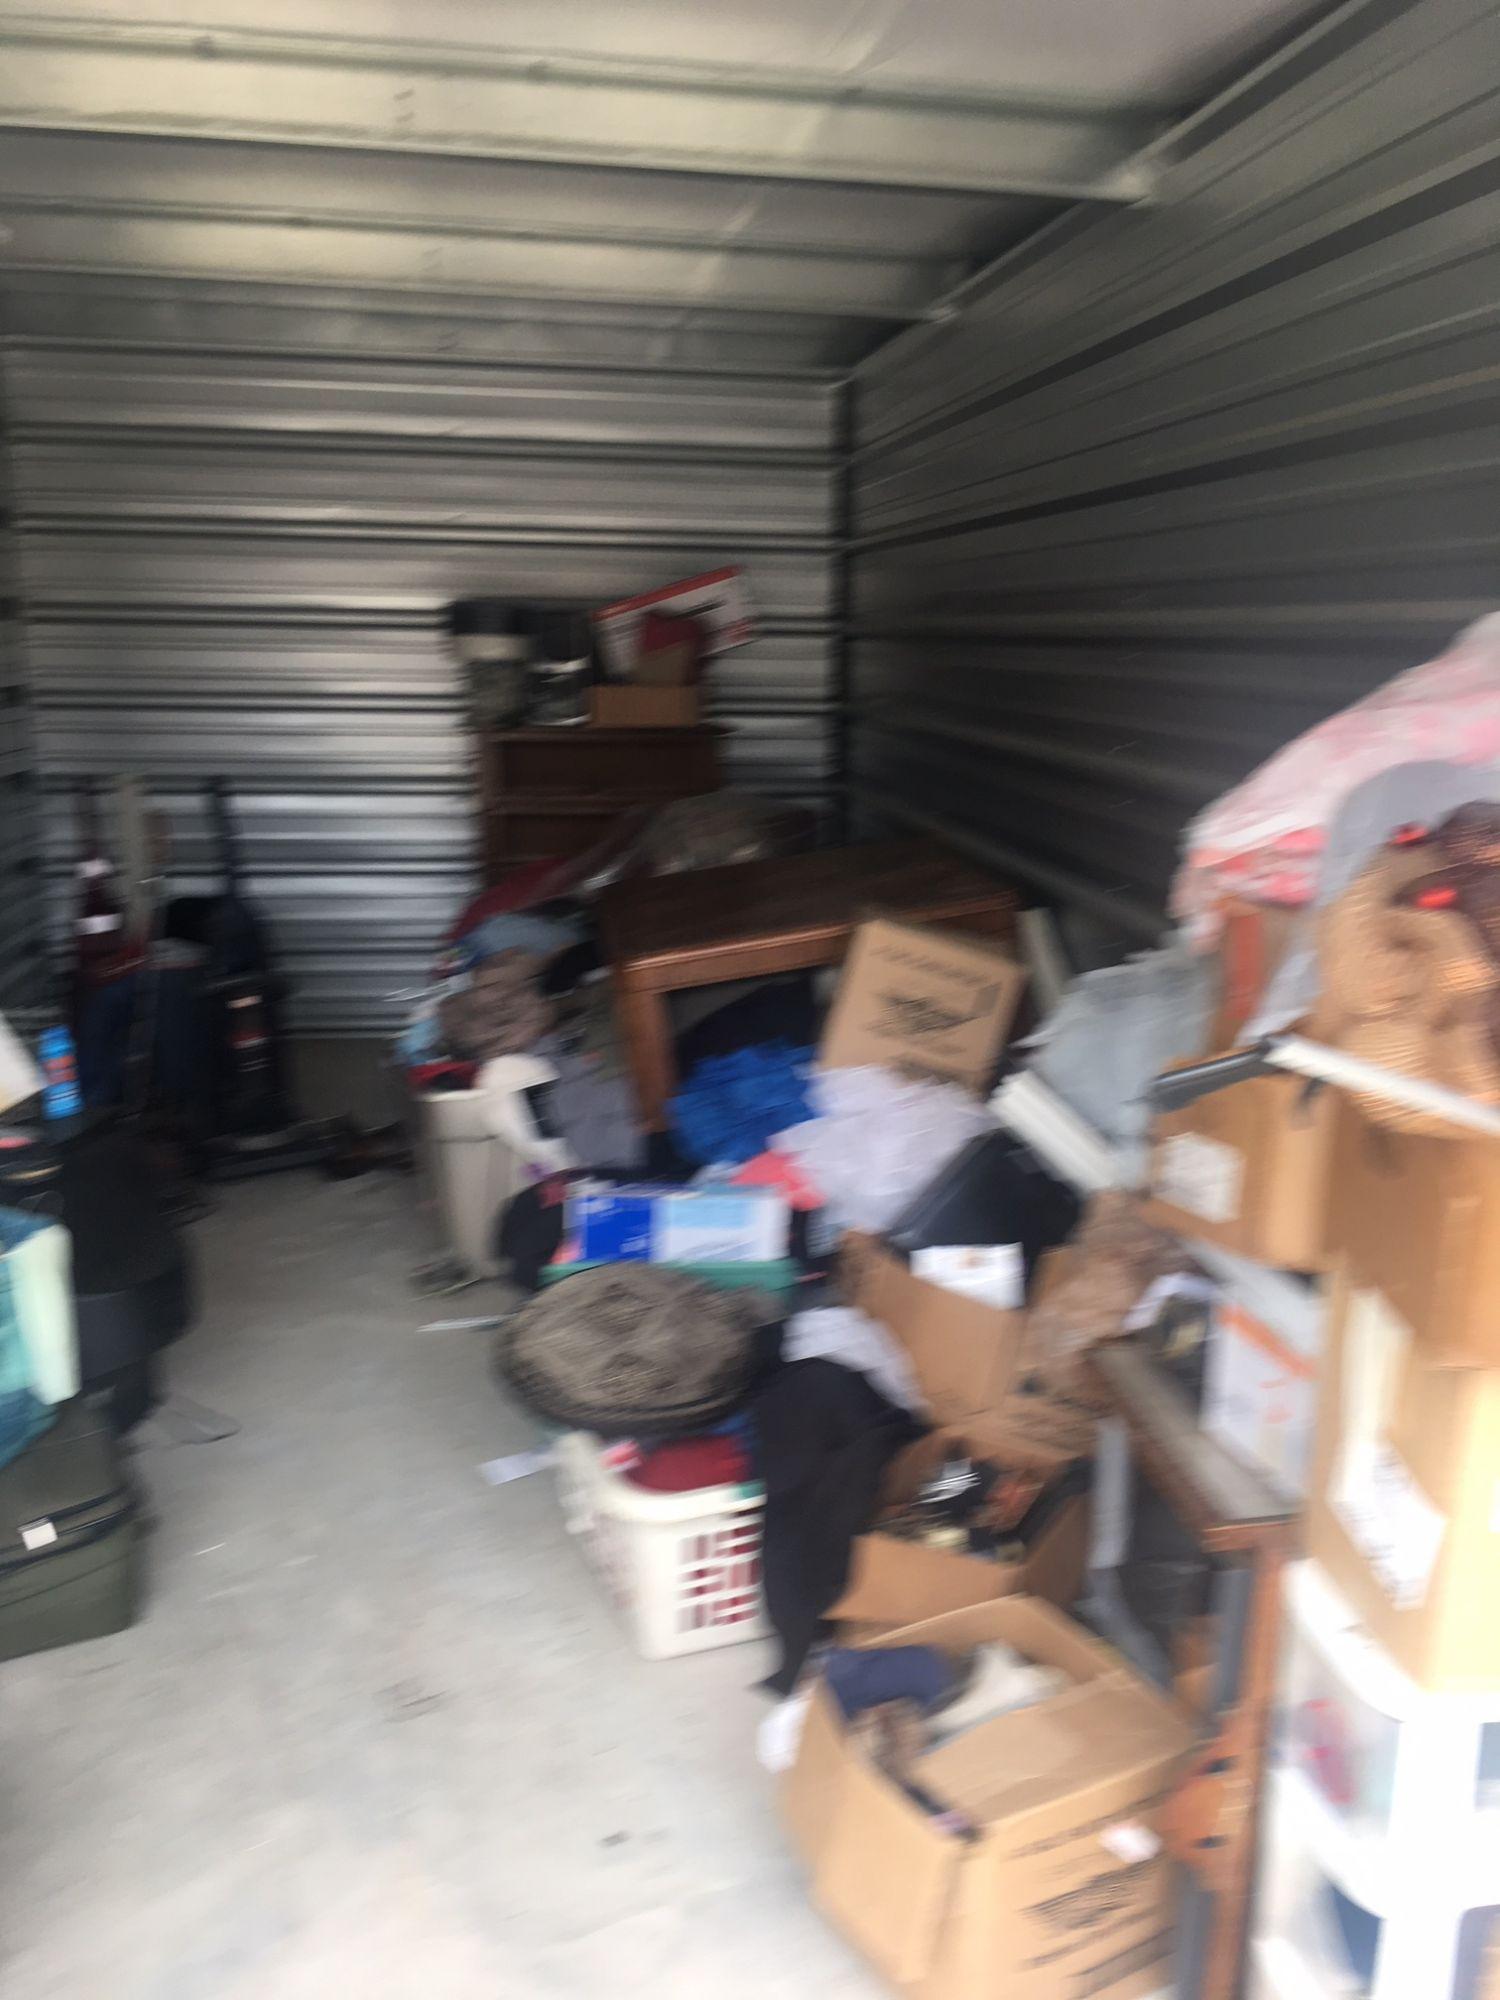 CLICK THUMBNAIL TO VIEW. Jonesboro AR. Strawfloor Self Storage & Storage Unit Auction: 544881 | Jonesboro AR | StorageTreasures.com